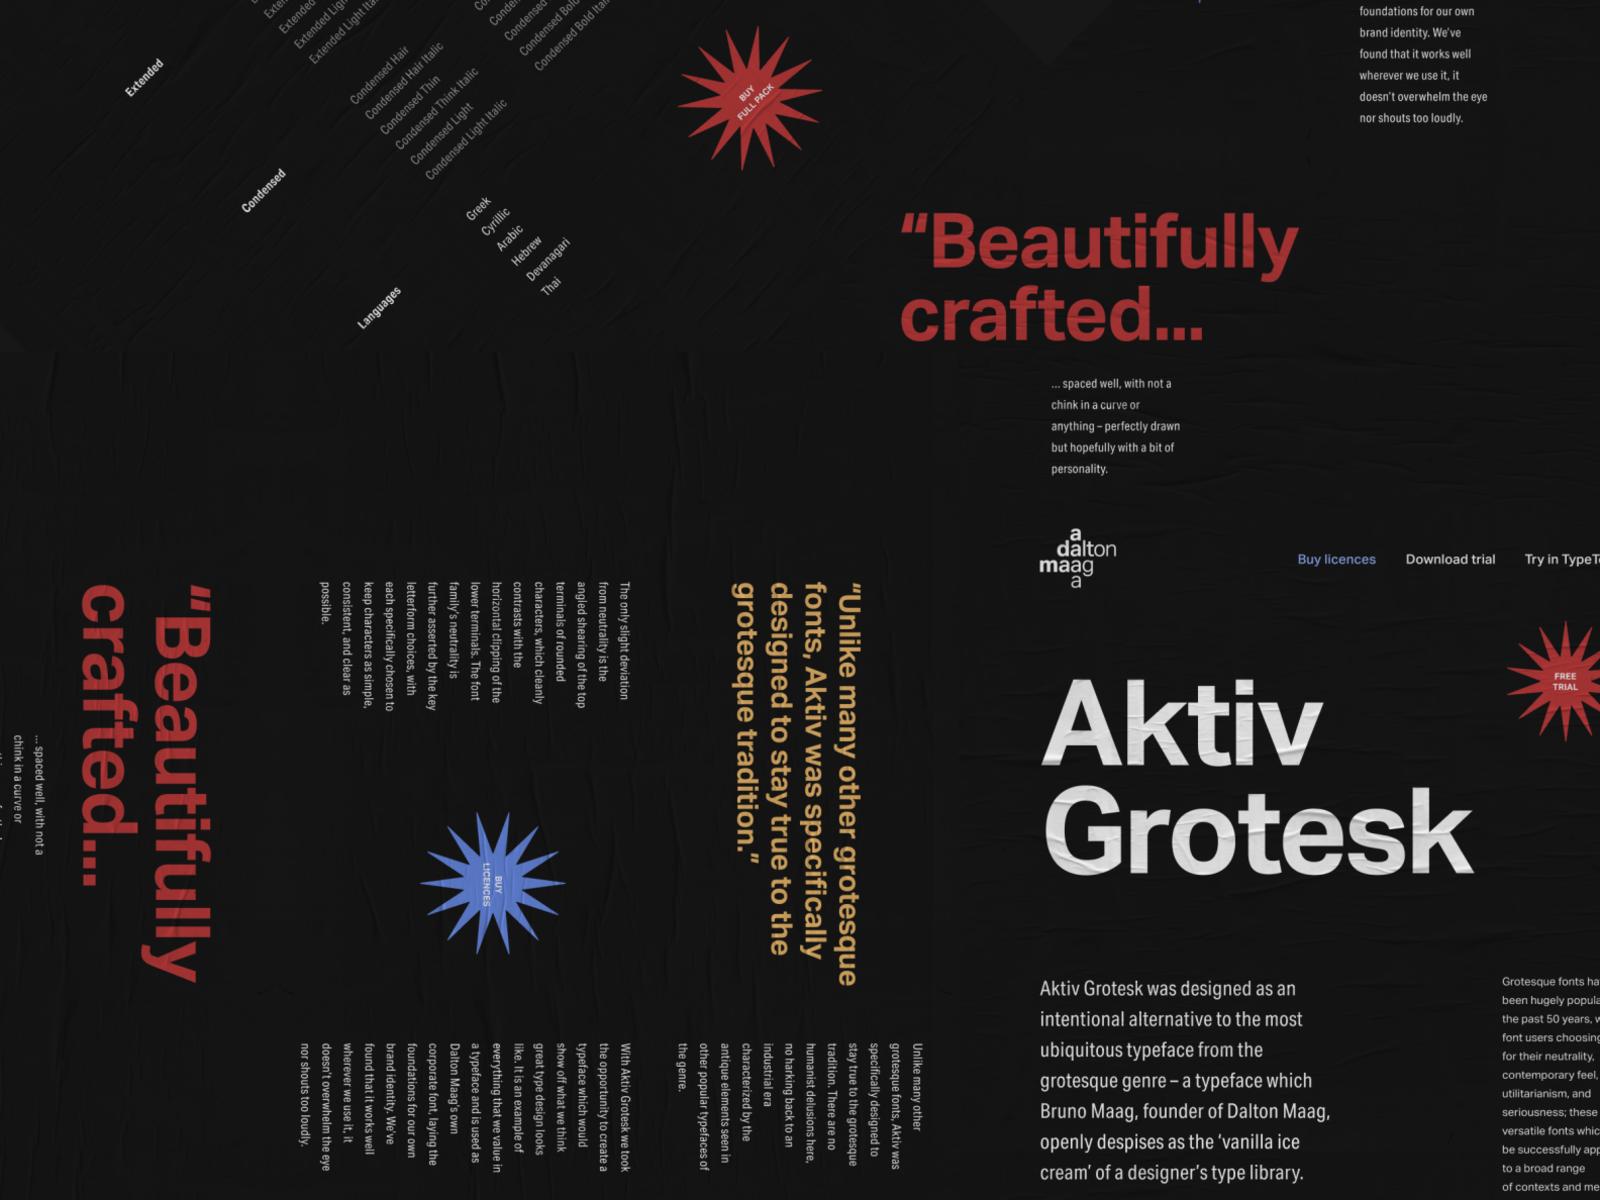 Aktiv Grotesk Landing Page by Denis on Dribbble